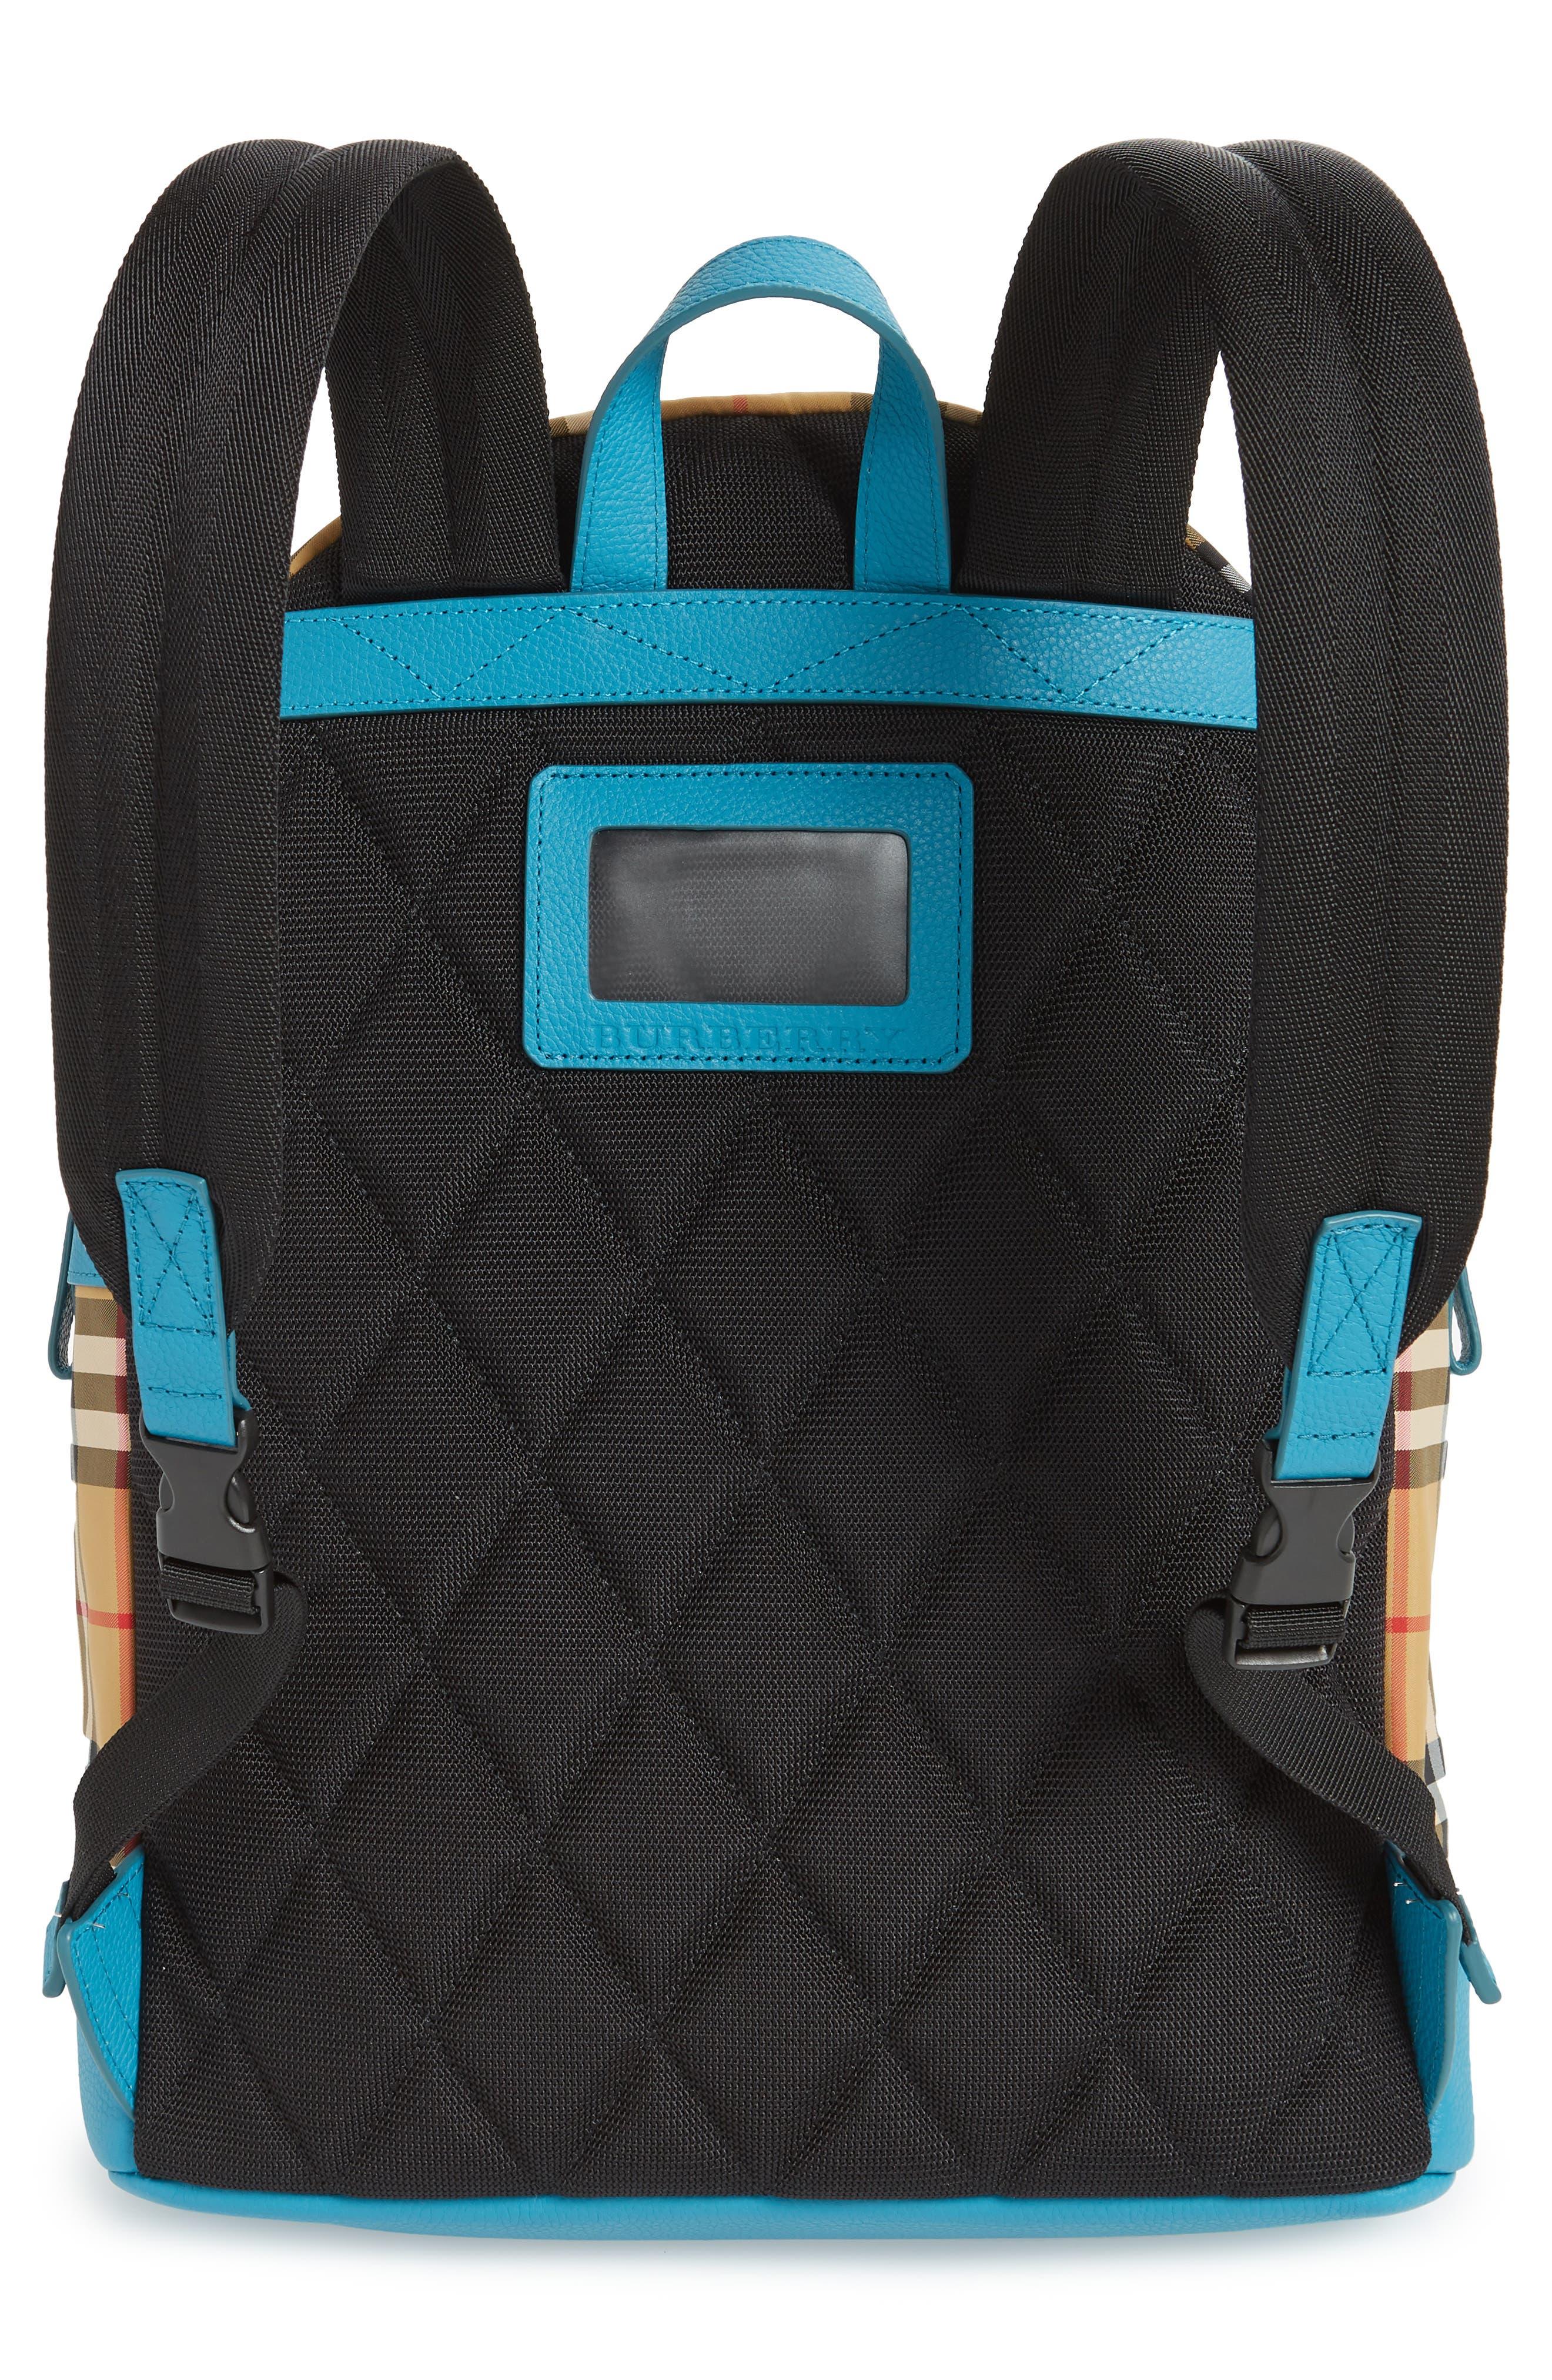 BURBERRY,                             Nico Sun Check Nylon Backpack,                             Alternate thumbnail 3, color,                             ANTIQUE YELLW IP CHK